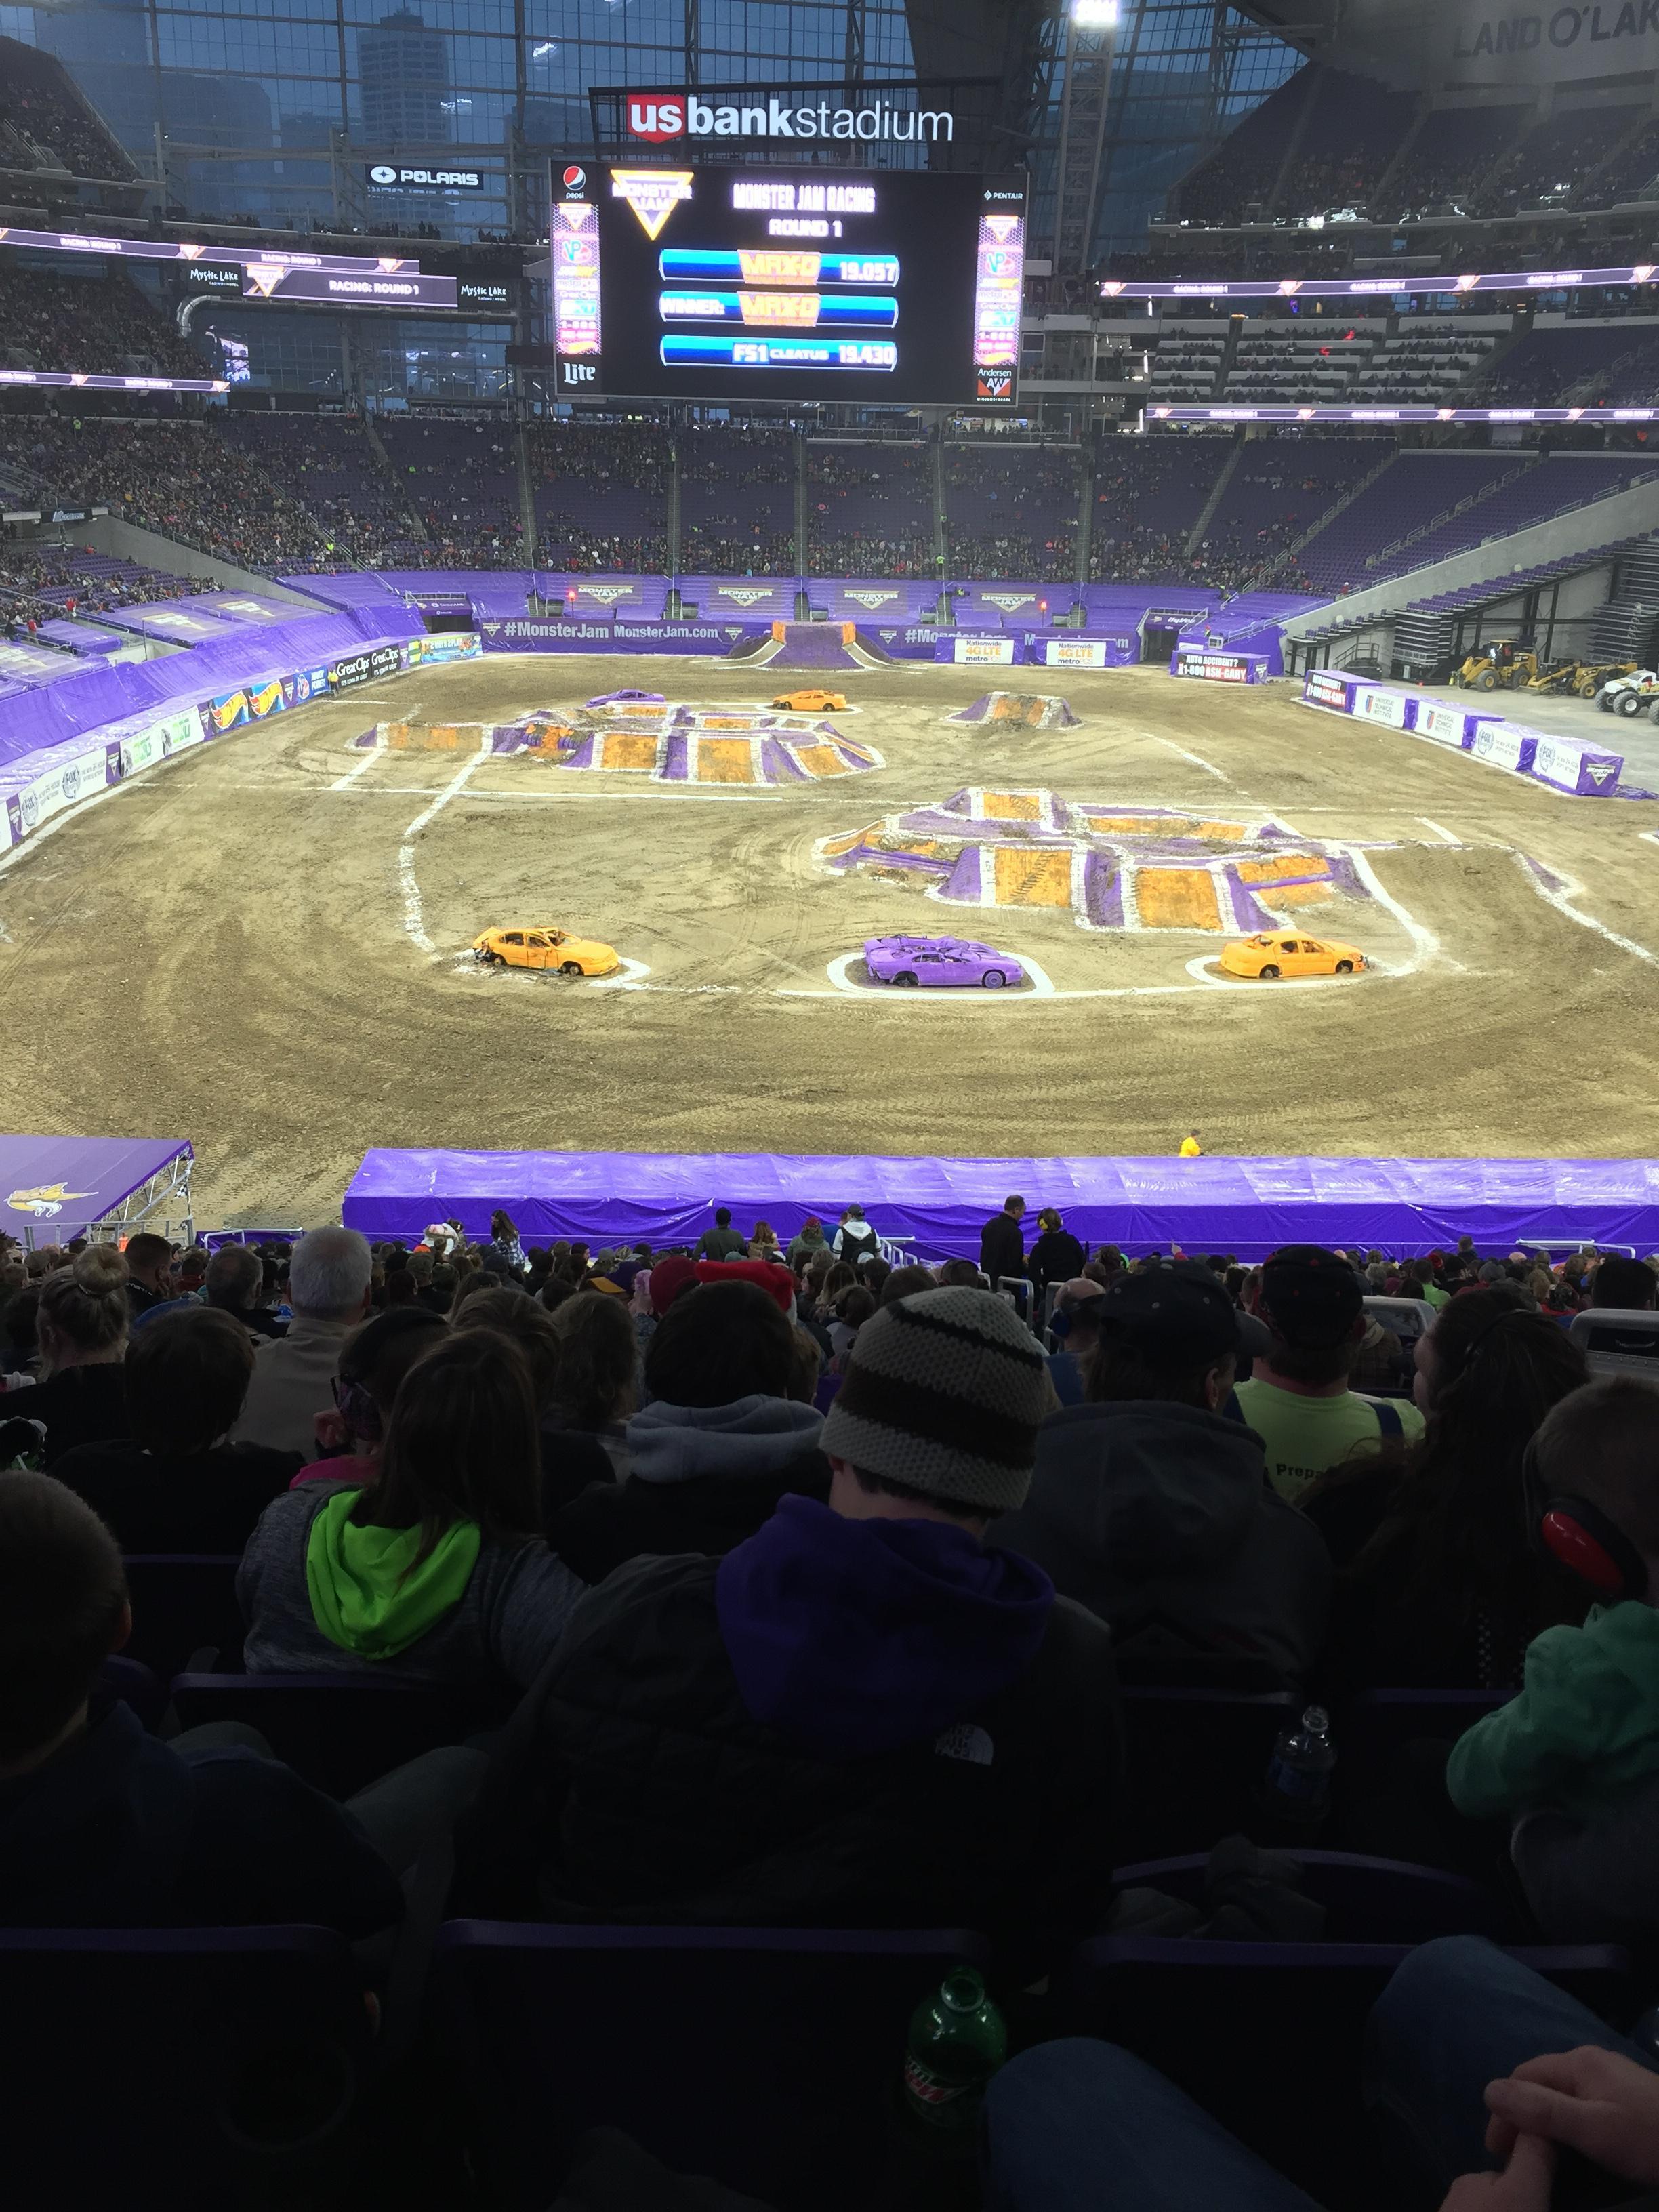 U.S. Bank Stadium Section 120 Row 39 Seat 3